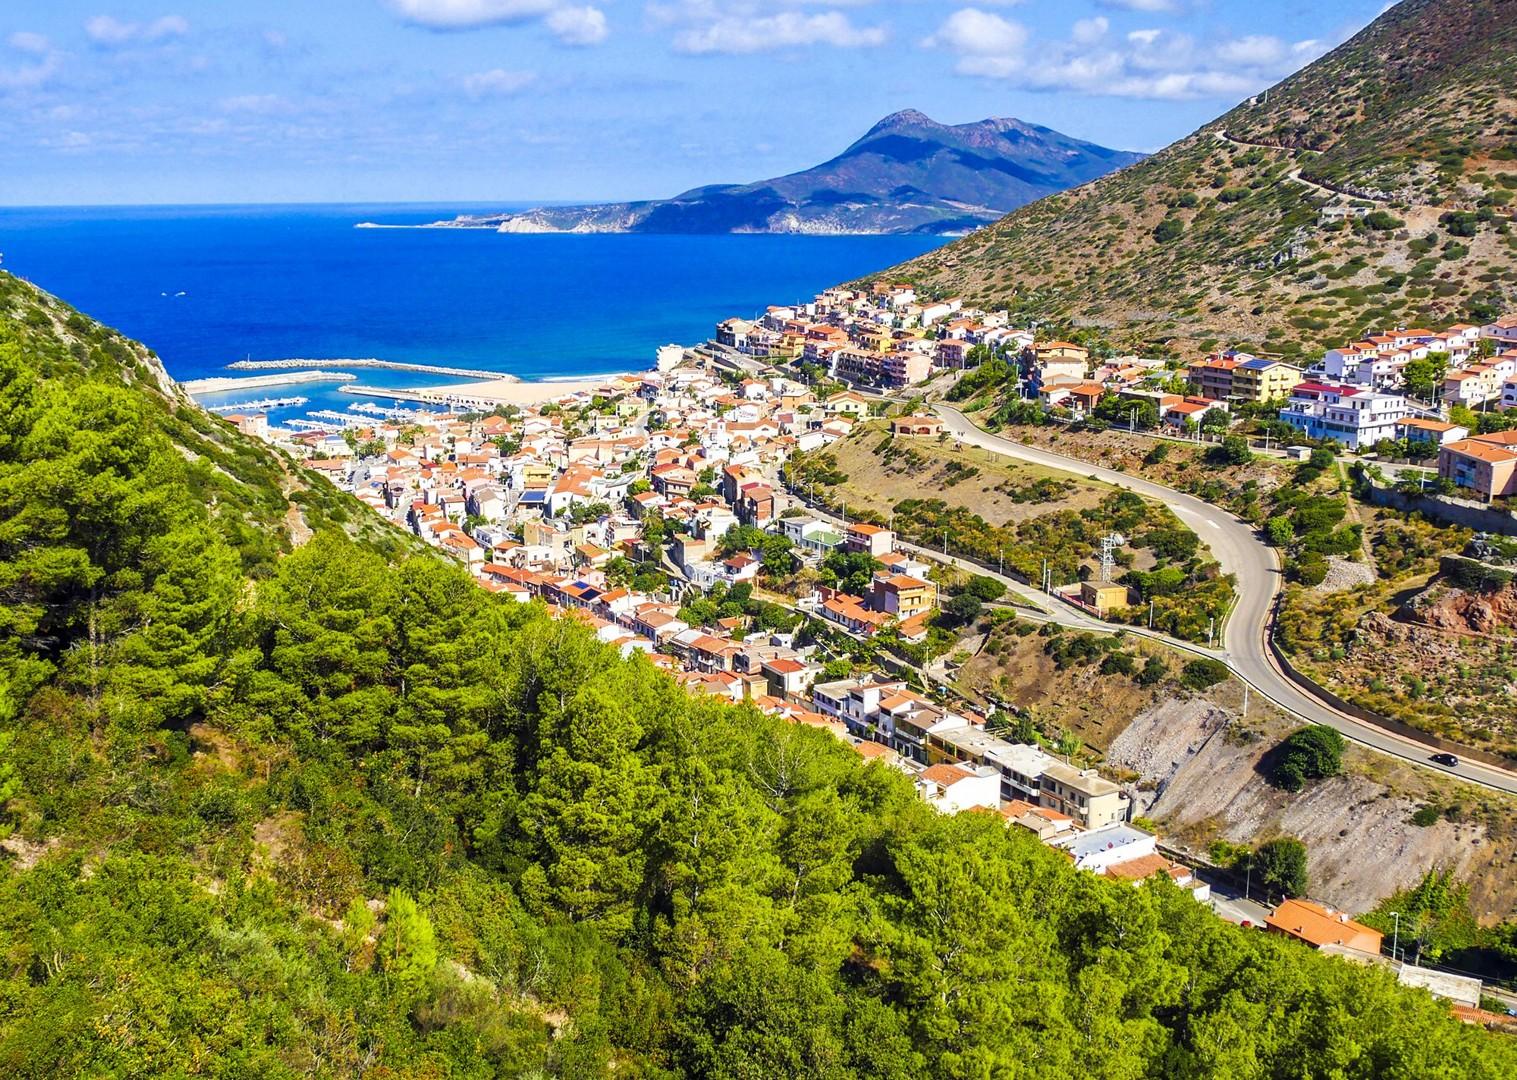 sardinia-views-self-guided-leisure-cycling-italian-island.jpg - Italy - Sardinia - Island Flavours - Self-Guided Leisure Cycling Holiday - Italia Leisure and Family Cycling